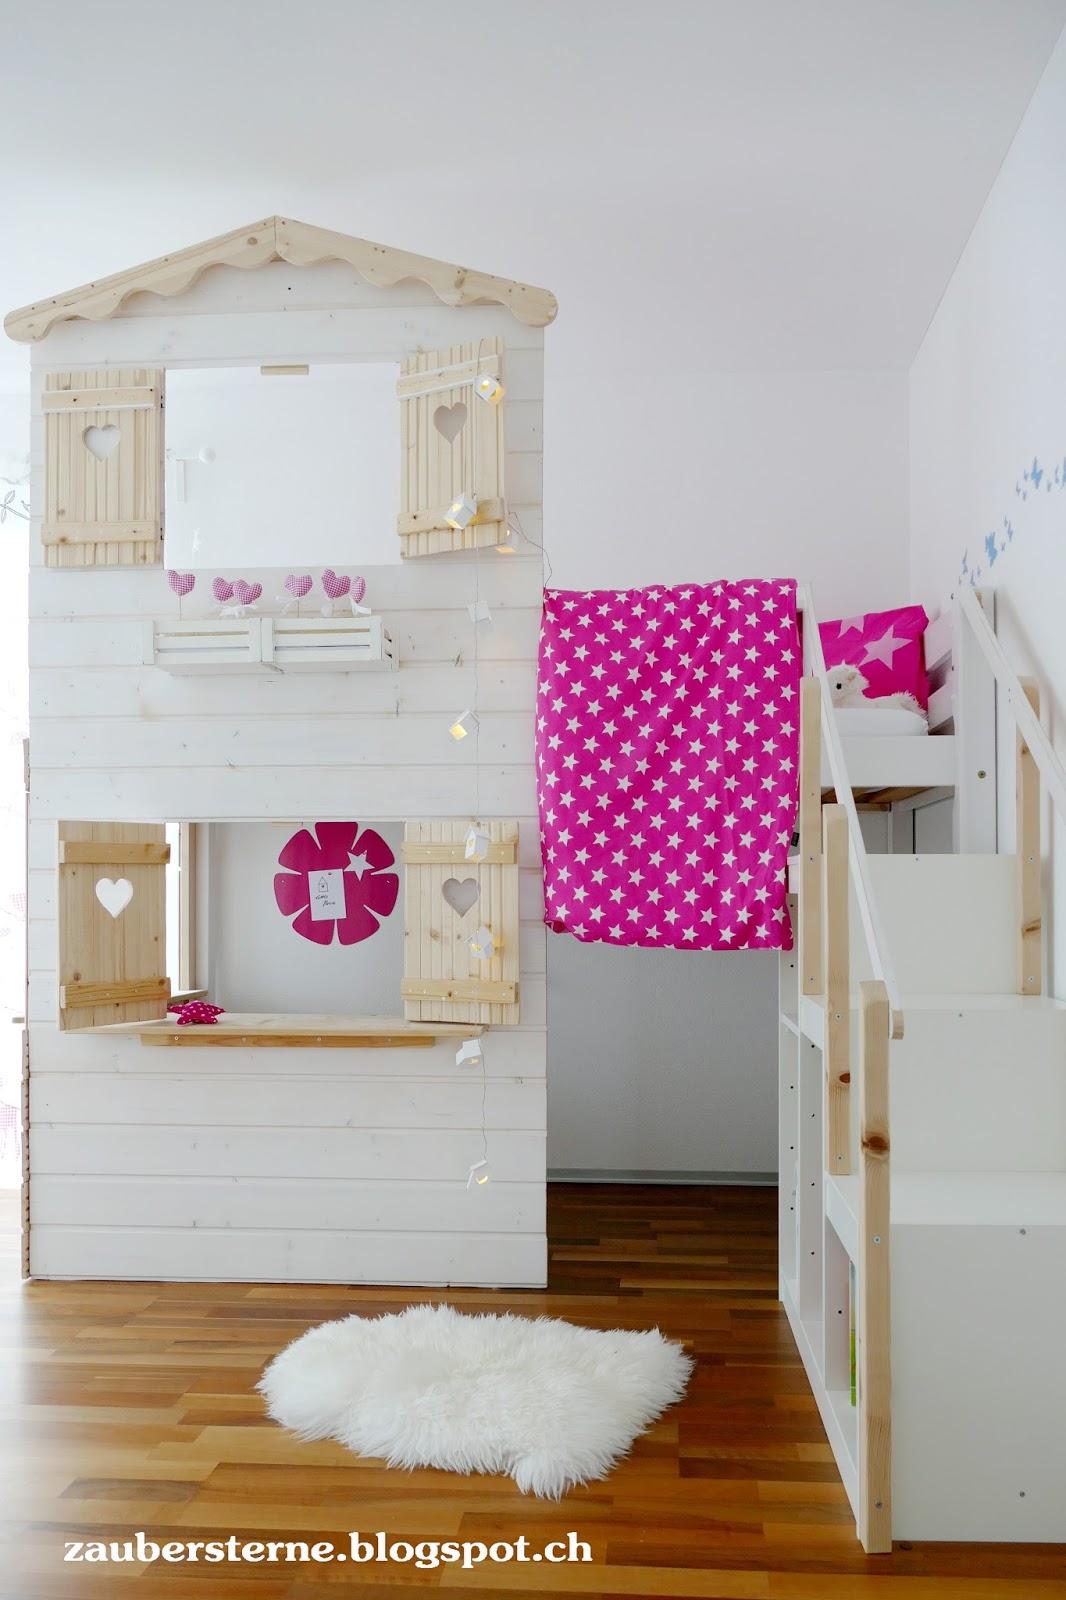 diy hochbett free ein hochbett selber bauen u diy anleitung with diy hochbett cool gallery of. Black Bedroom Furniture Sets. Home Design Ideas